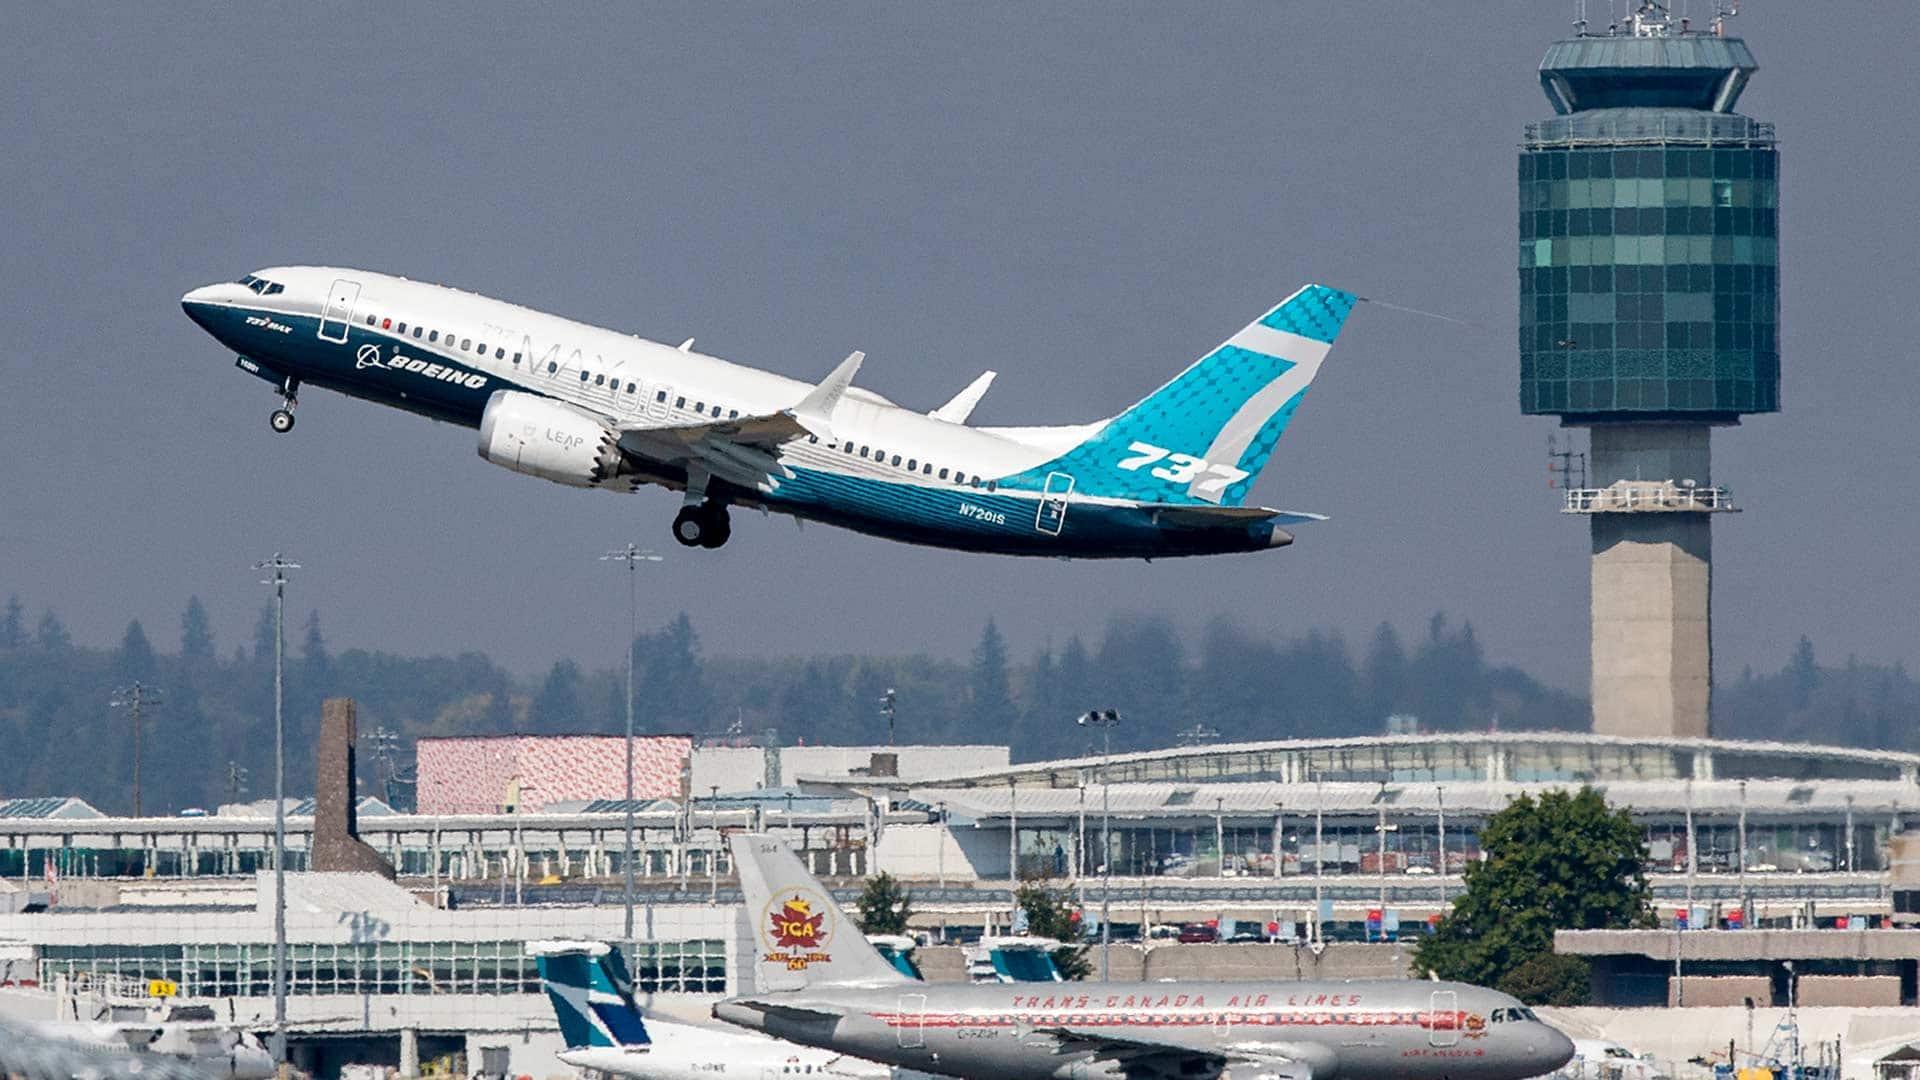 Senate investigators report flays FAA over Boeing jets